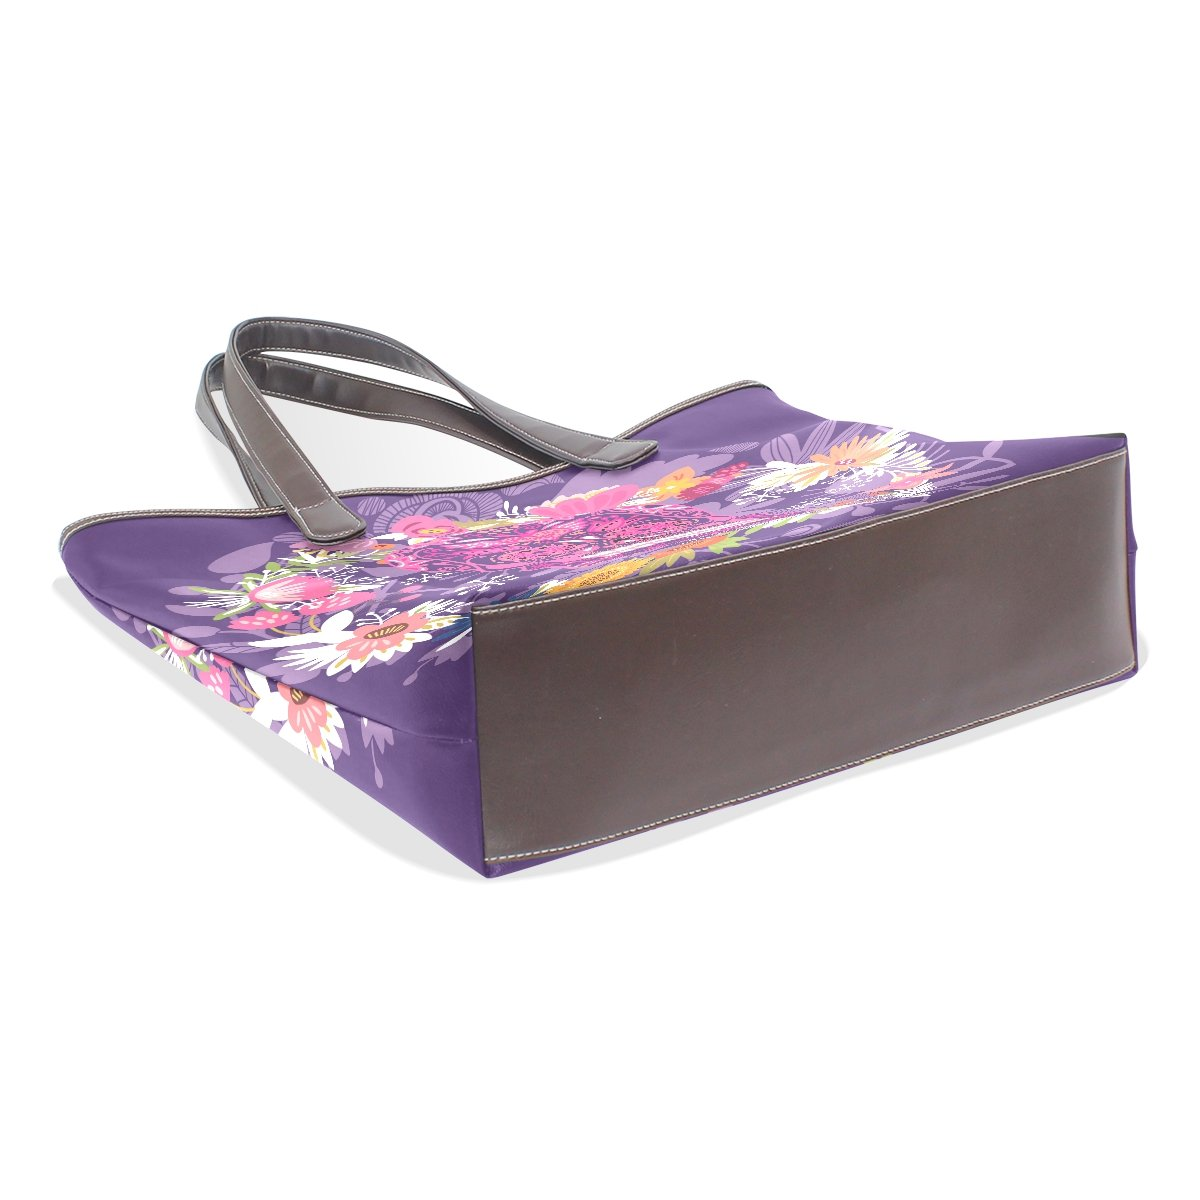 Ye Store Purple Skull Lady PU Leather Handbag Tote Bag Shoulder Bag Shopping Bag